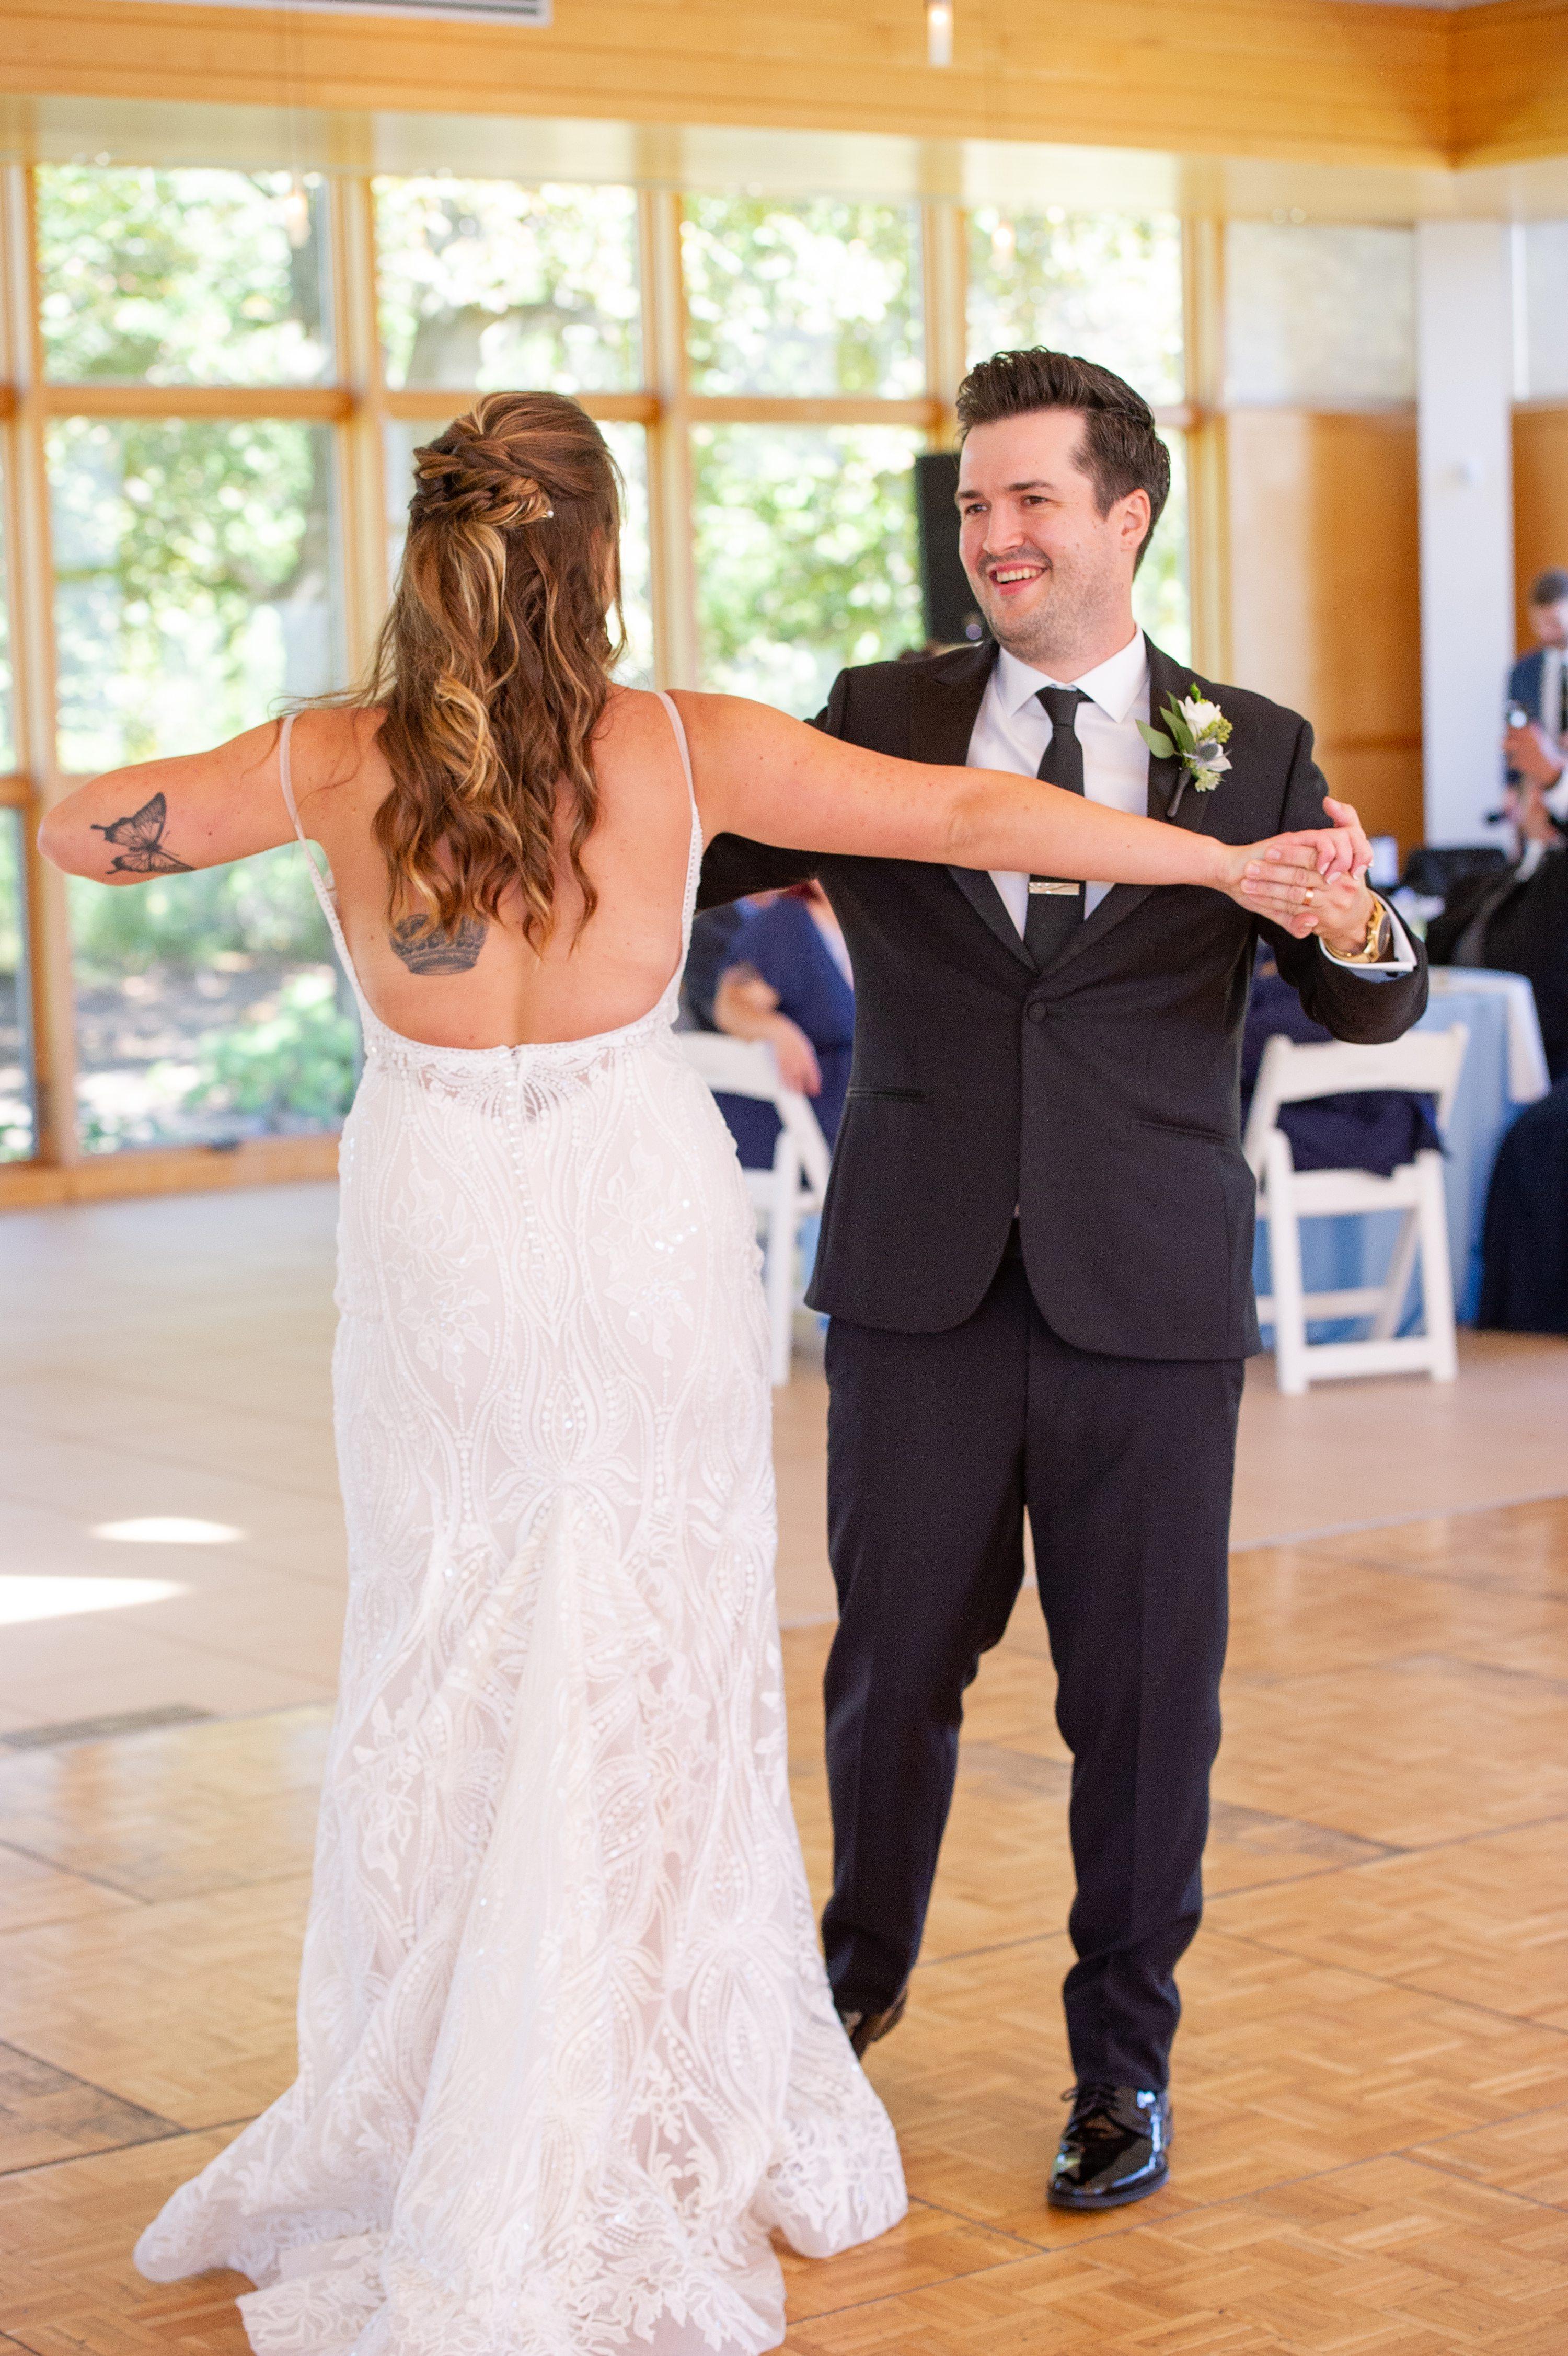 Laura Meyer Photography, Chicago wedding photographer